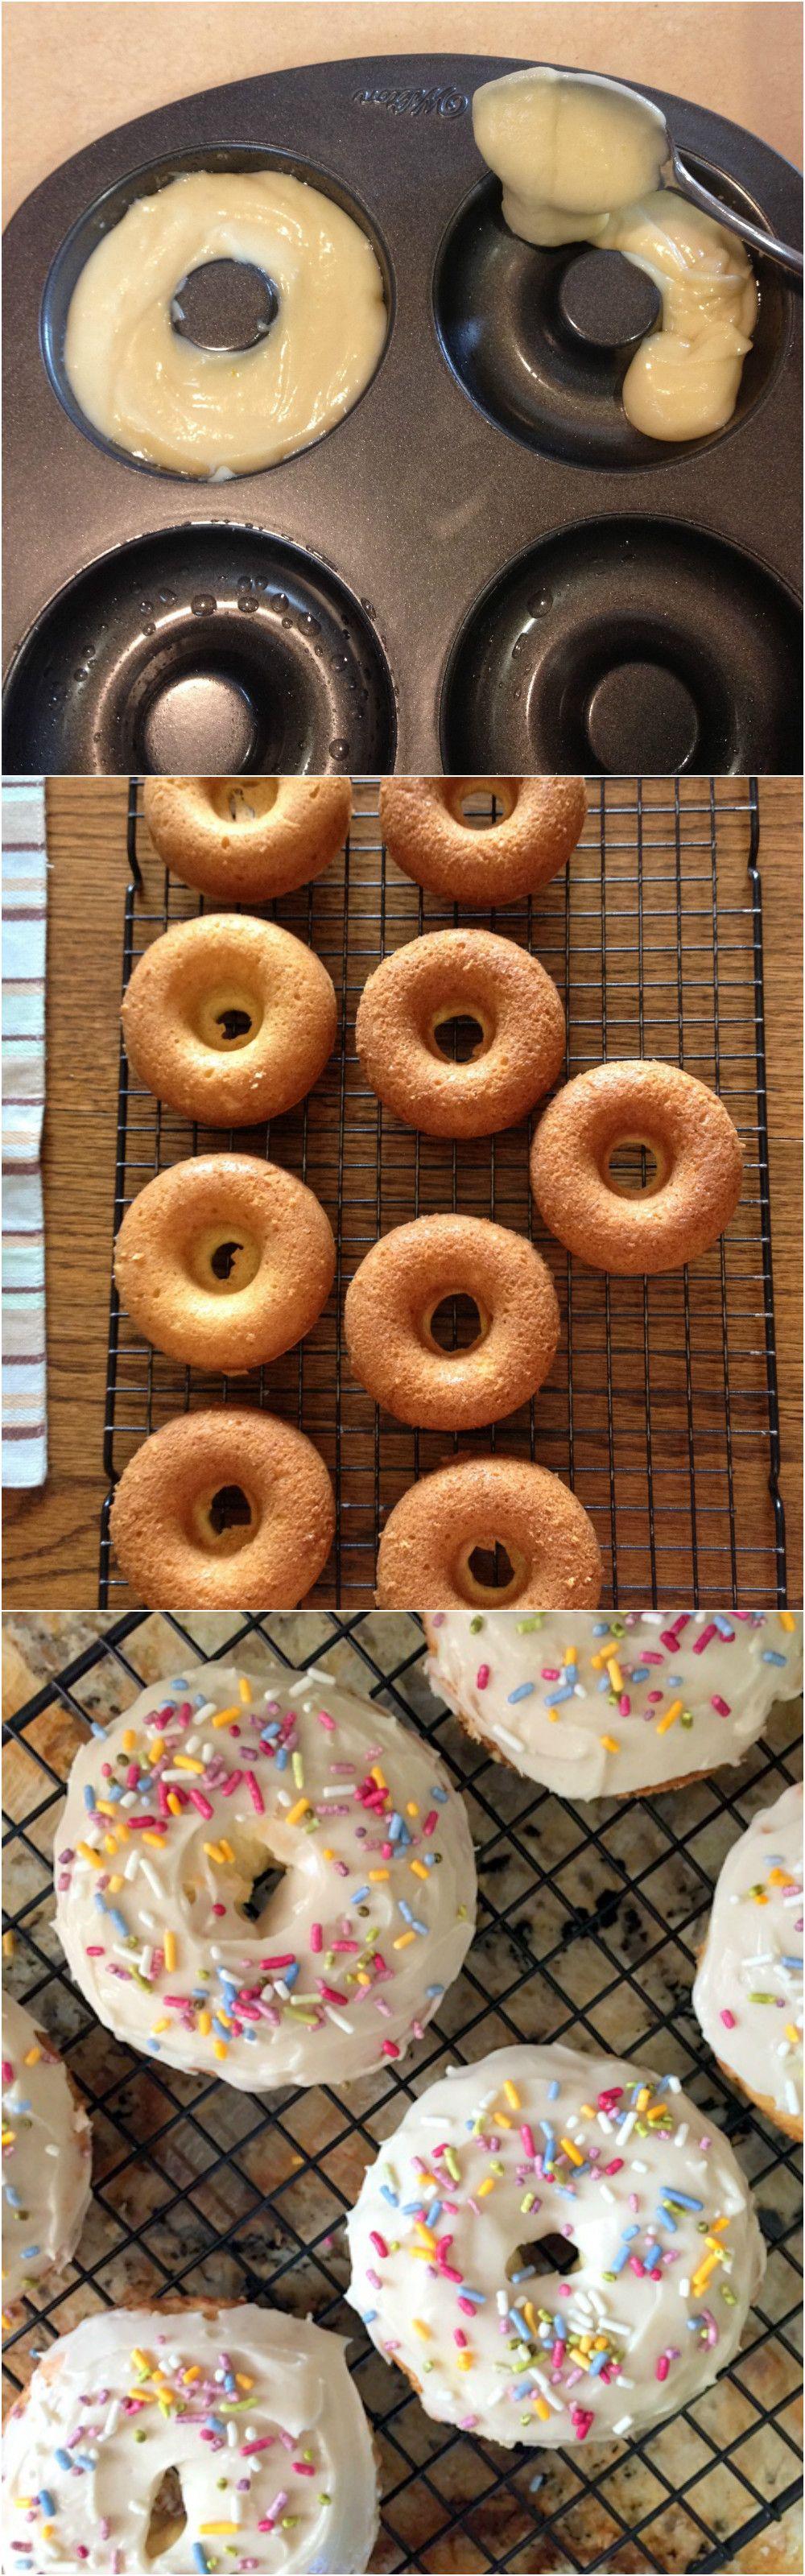 Oven Baked Vanilla Cake Donuts with Frosting & Sprinkles! #donut #doughnut #breakfast